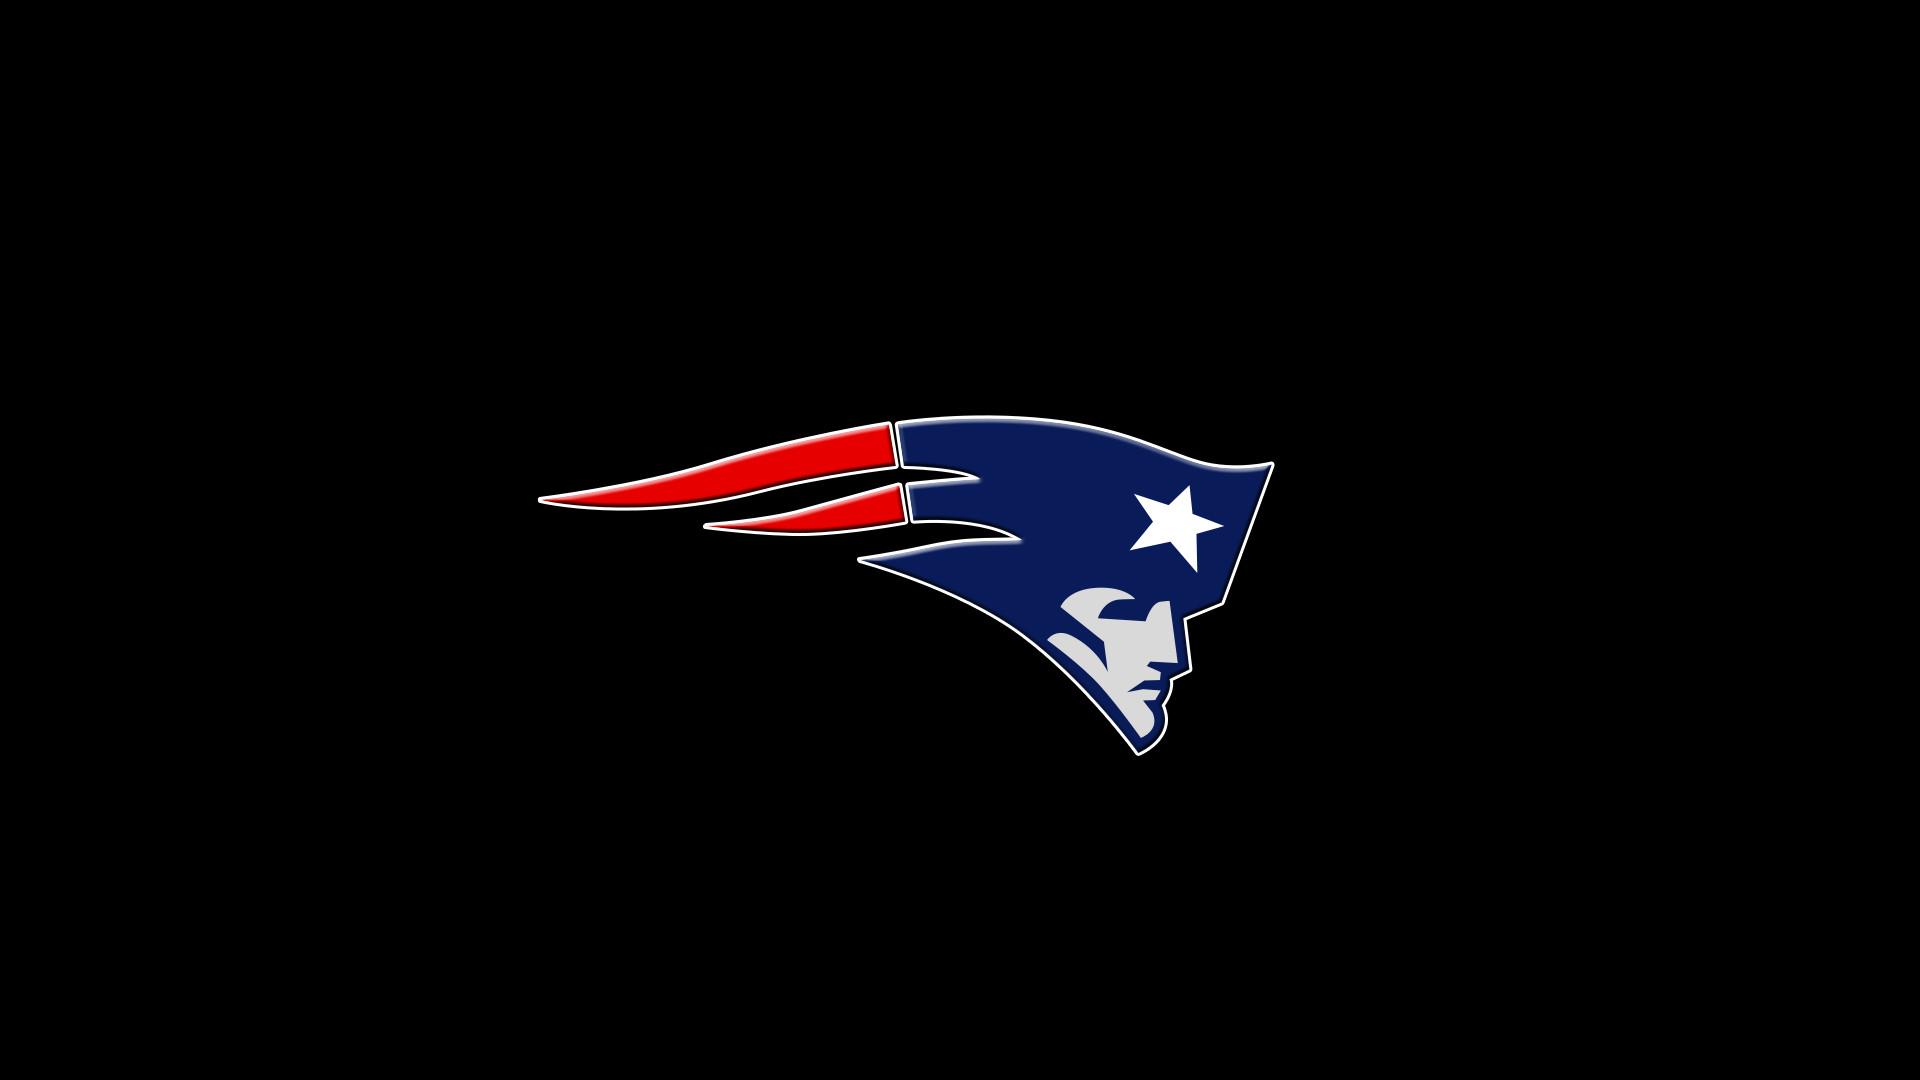 Patriot Logo Wallpaper 76 Images